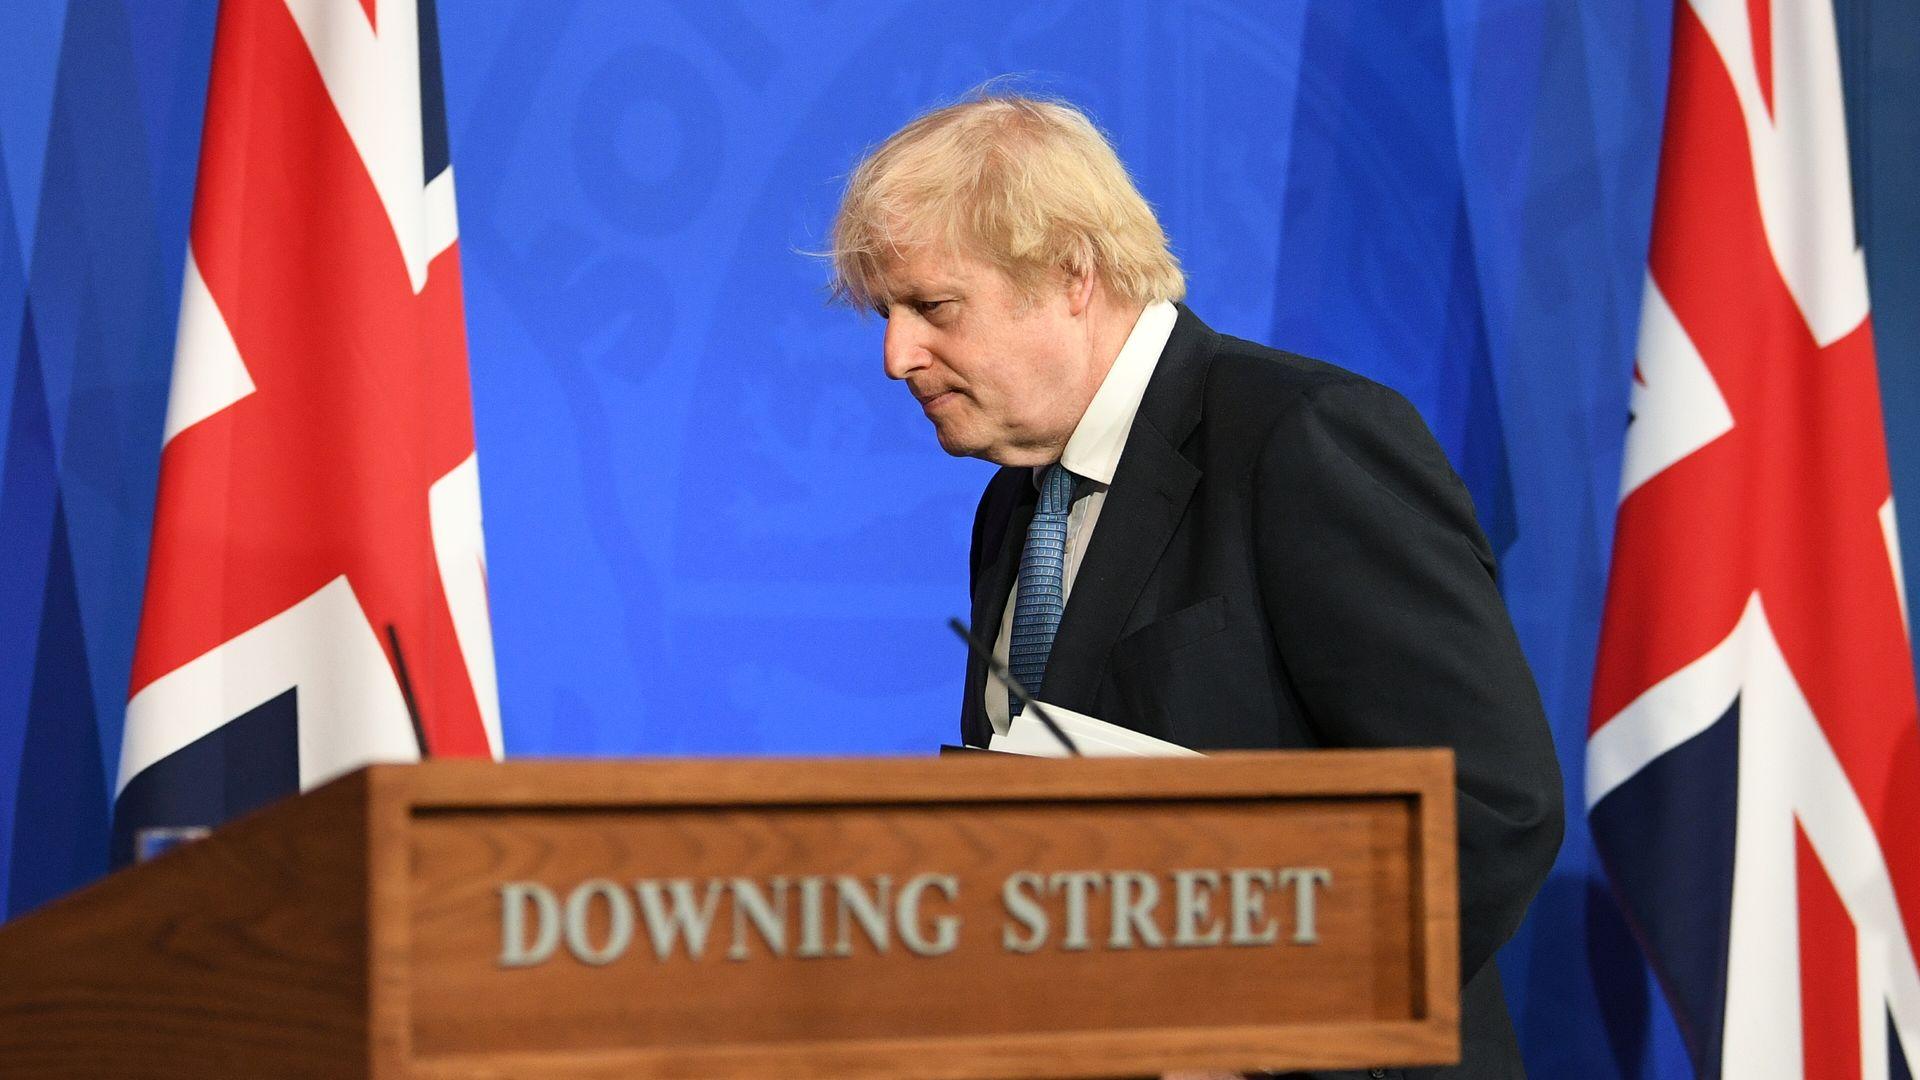 Prime minister Boris Johnson at a Downing Street briefing - Credit: PA